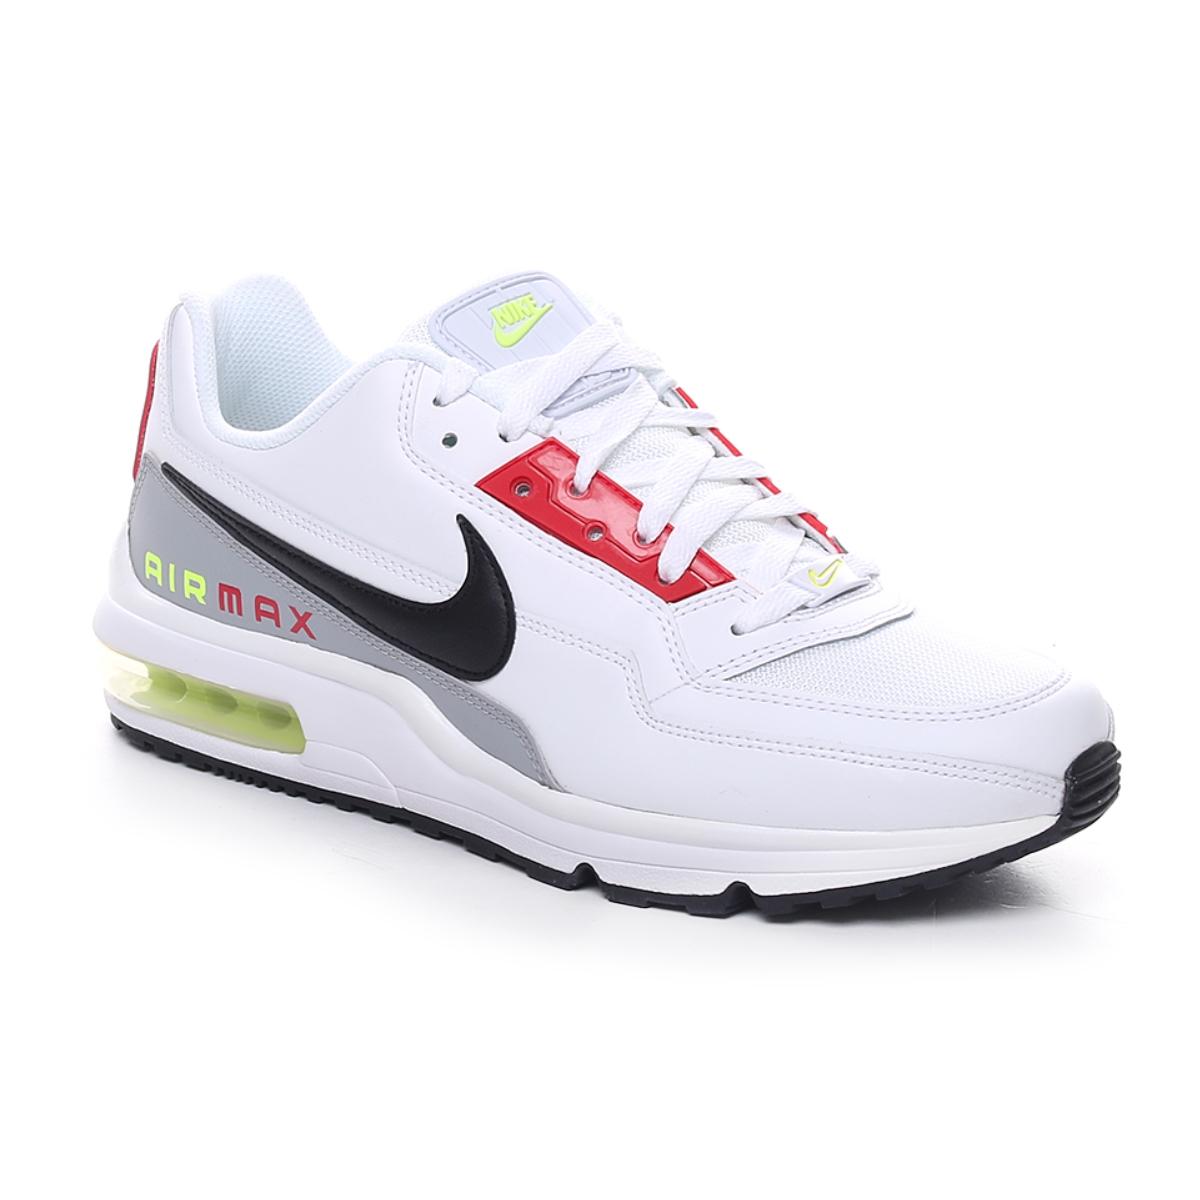 Nike Air Max Ltd 3 Uomo Bianco Rosso